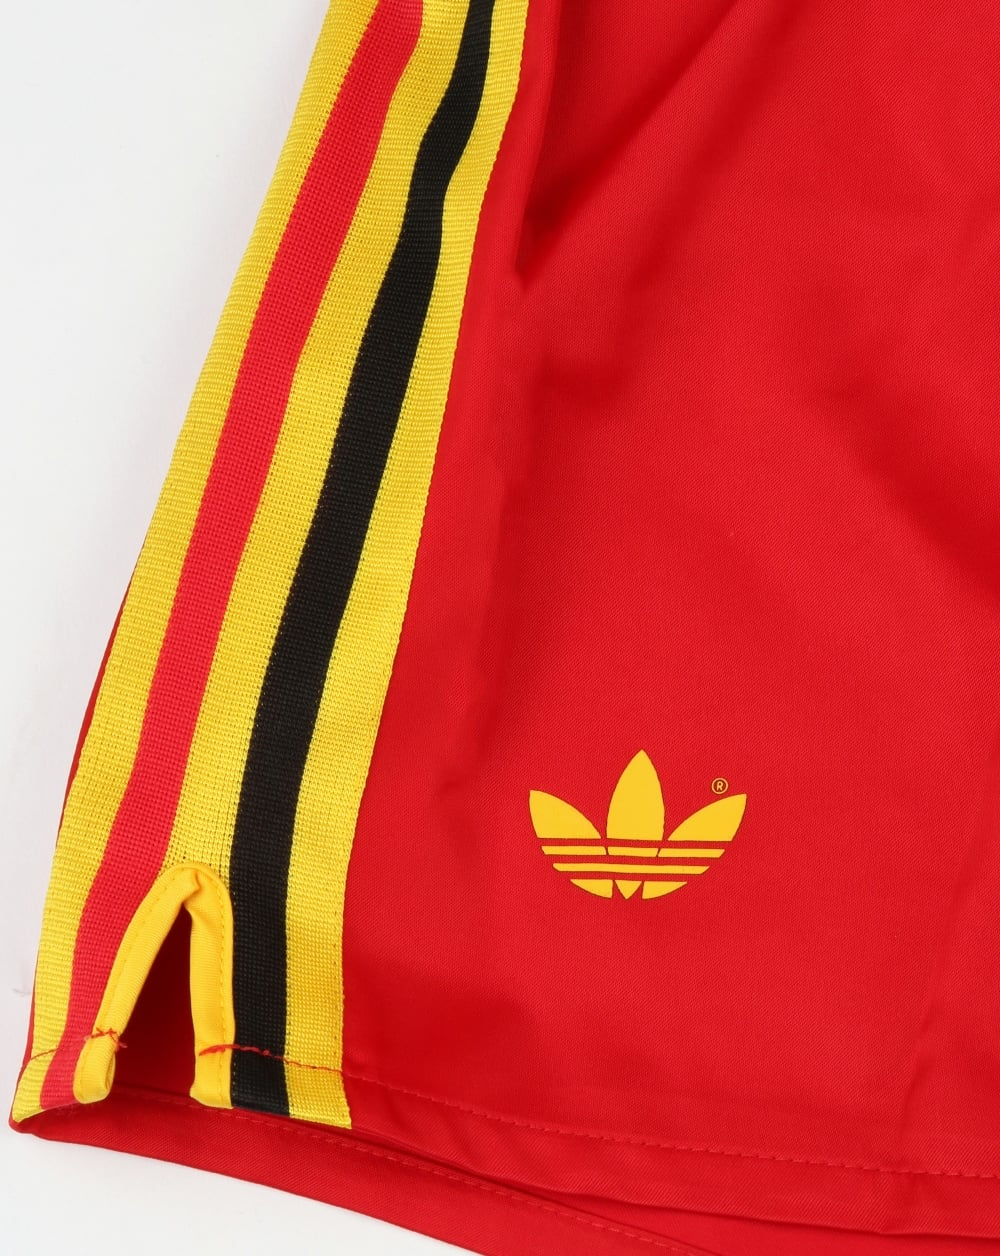 c98640a2f Adidas Originals Belgium Shorts Victory Red,football,retro,shiny,mens